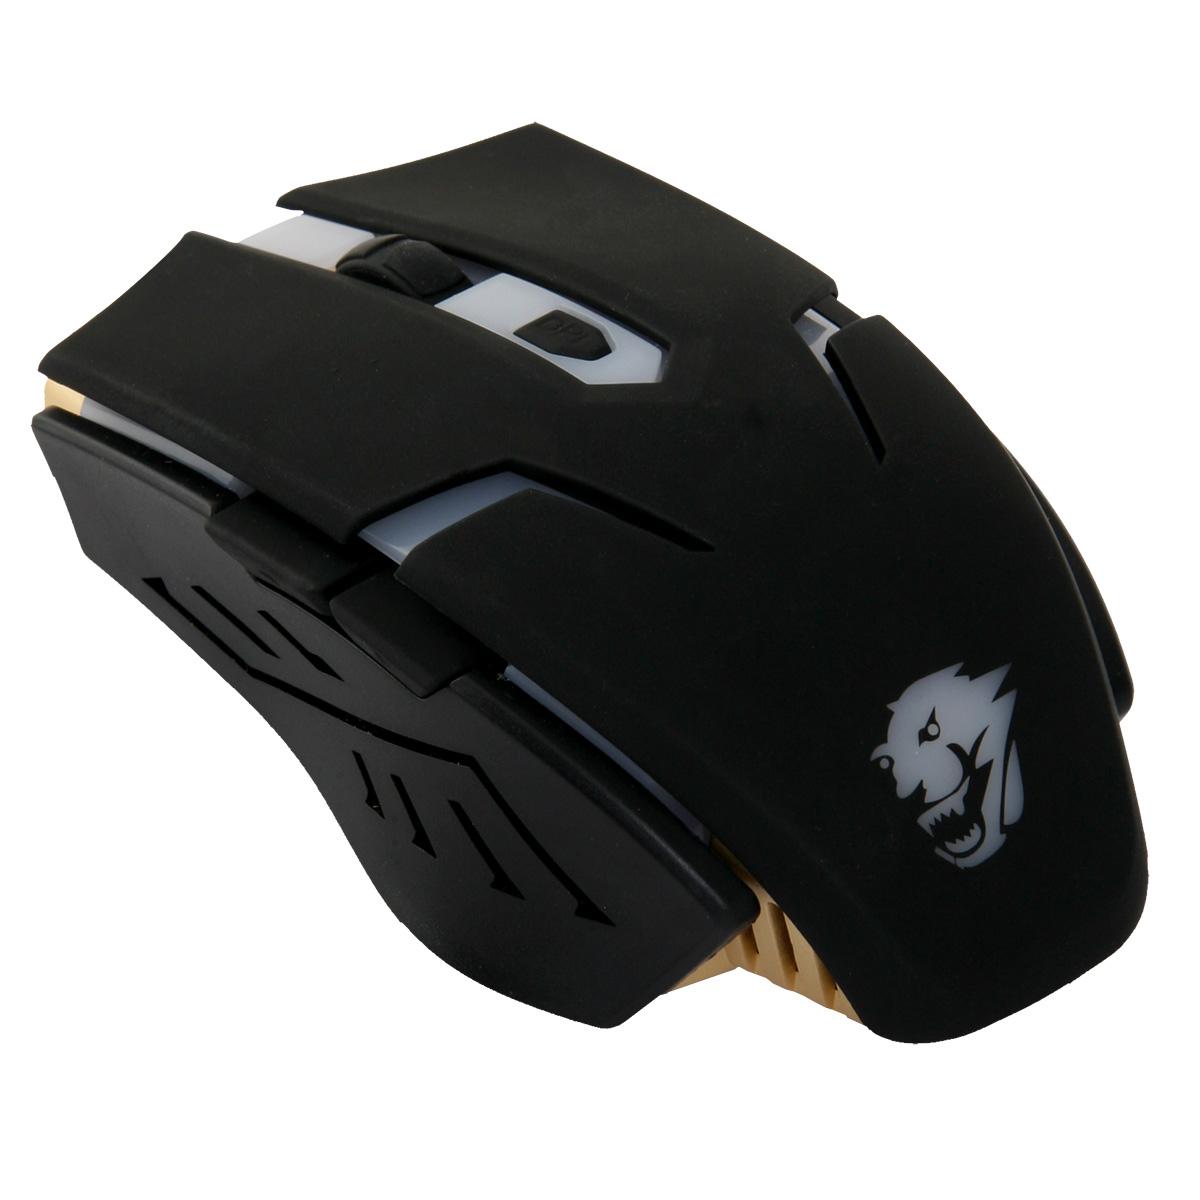 Powercool GM002V2 USB 2400DPI Black Right-hand mice